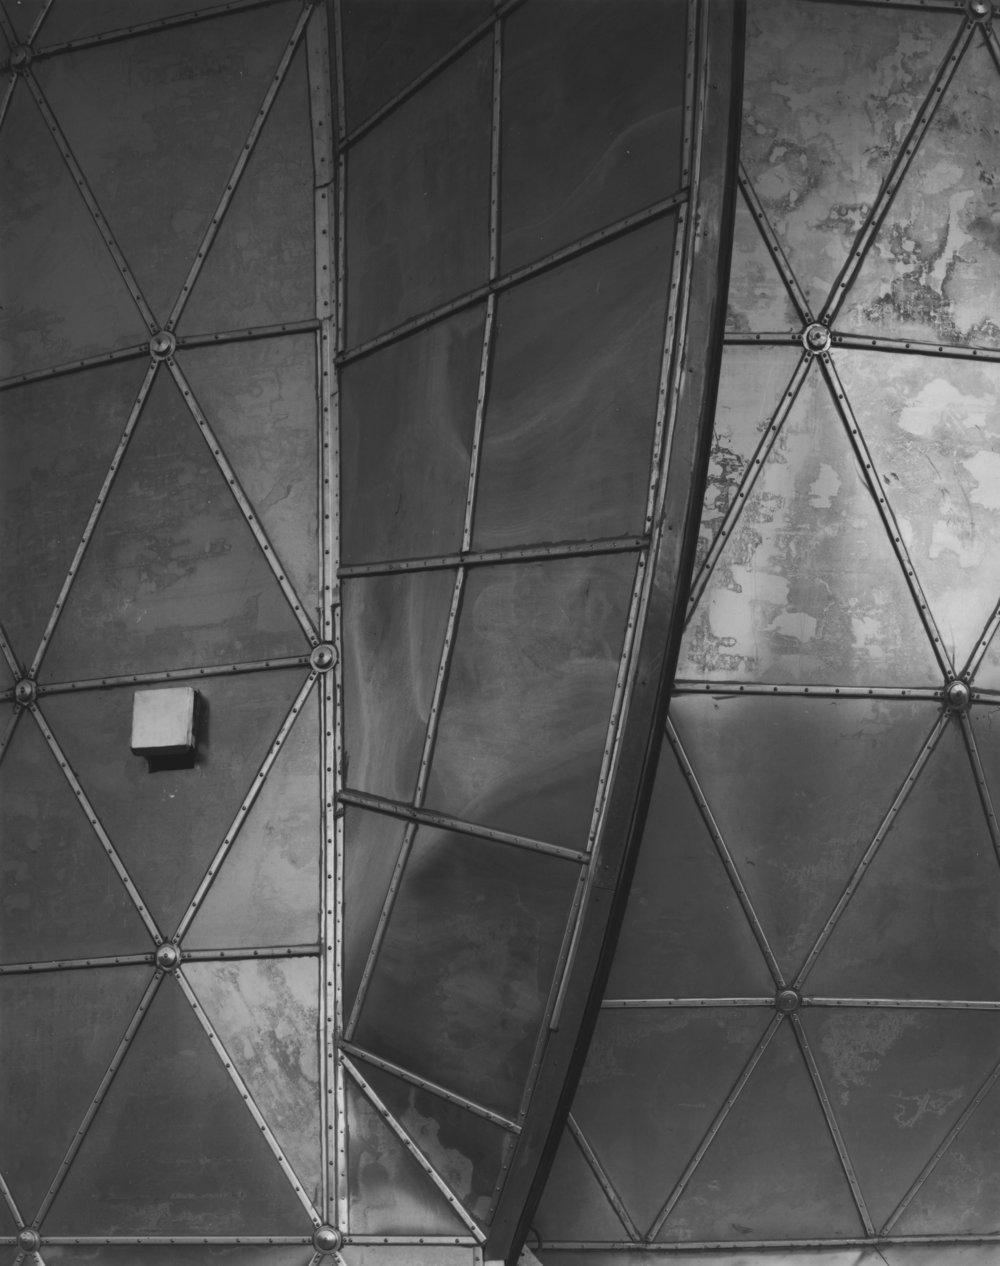 Caltech Submillimeter Telescope, Mauna Kea,